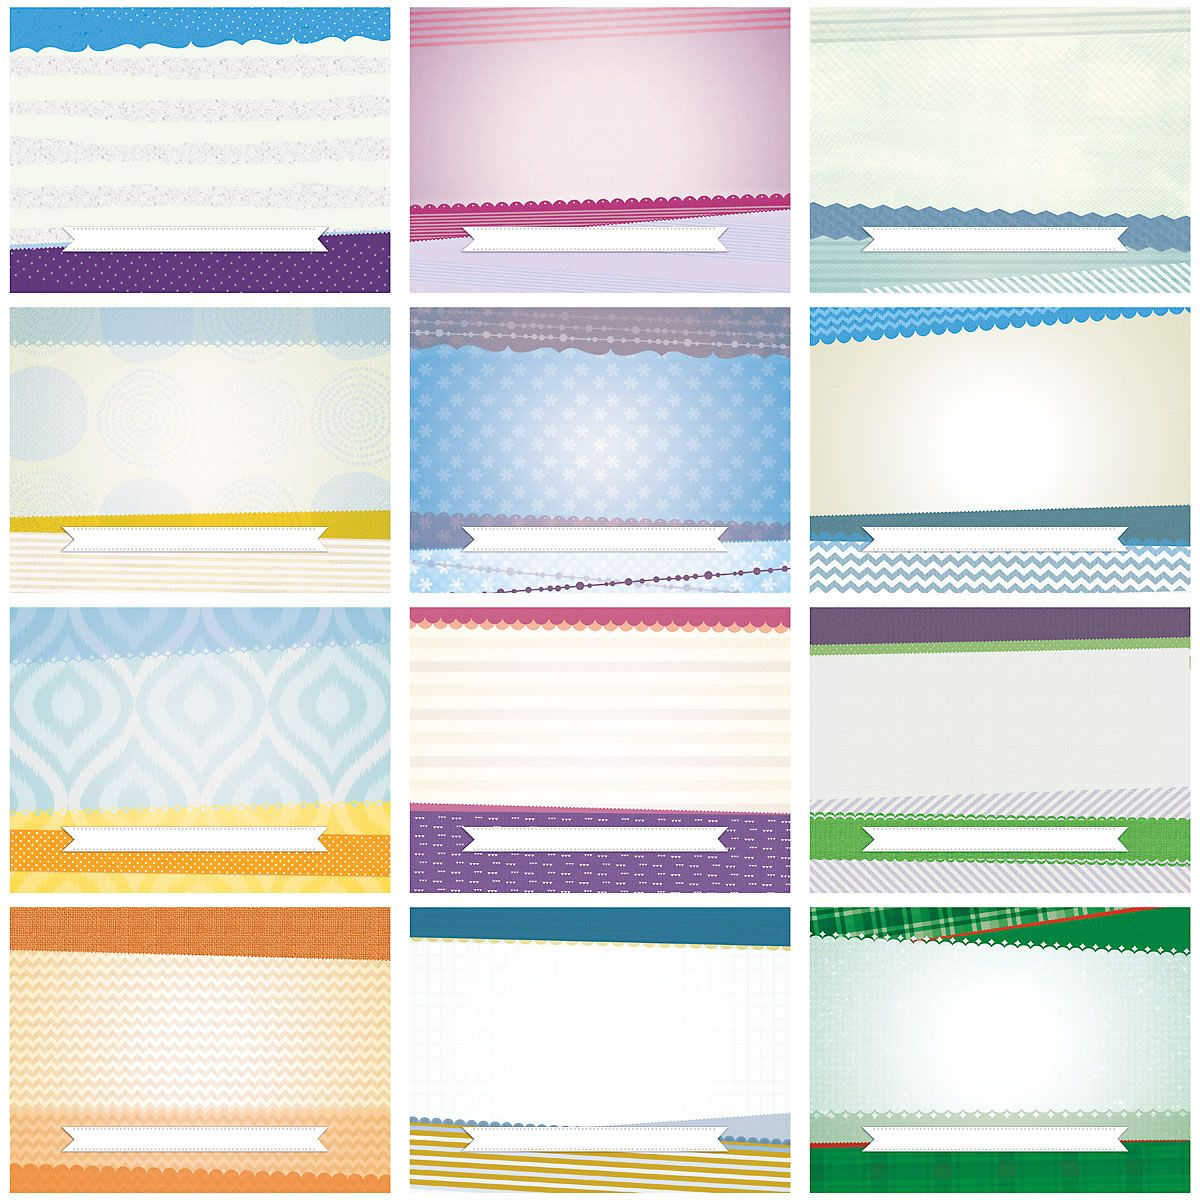 2019 Textures Photo Scrapbook Wall Calendar